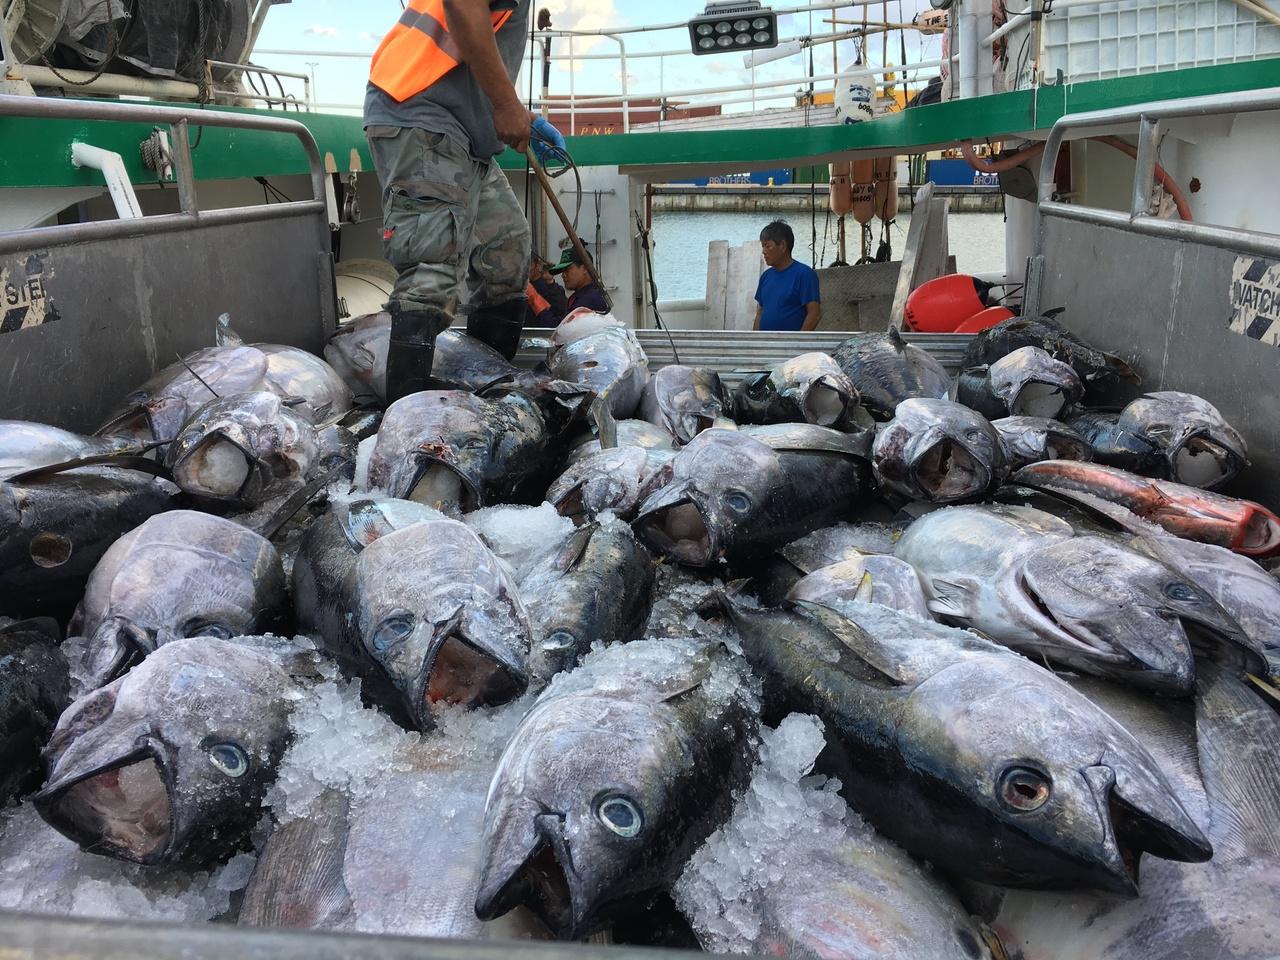 Fishermen unload a catch of ahi (tuna) from a longline fishing vessel at Pier 38 in Honolulu, Hawaii